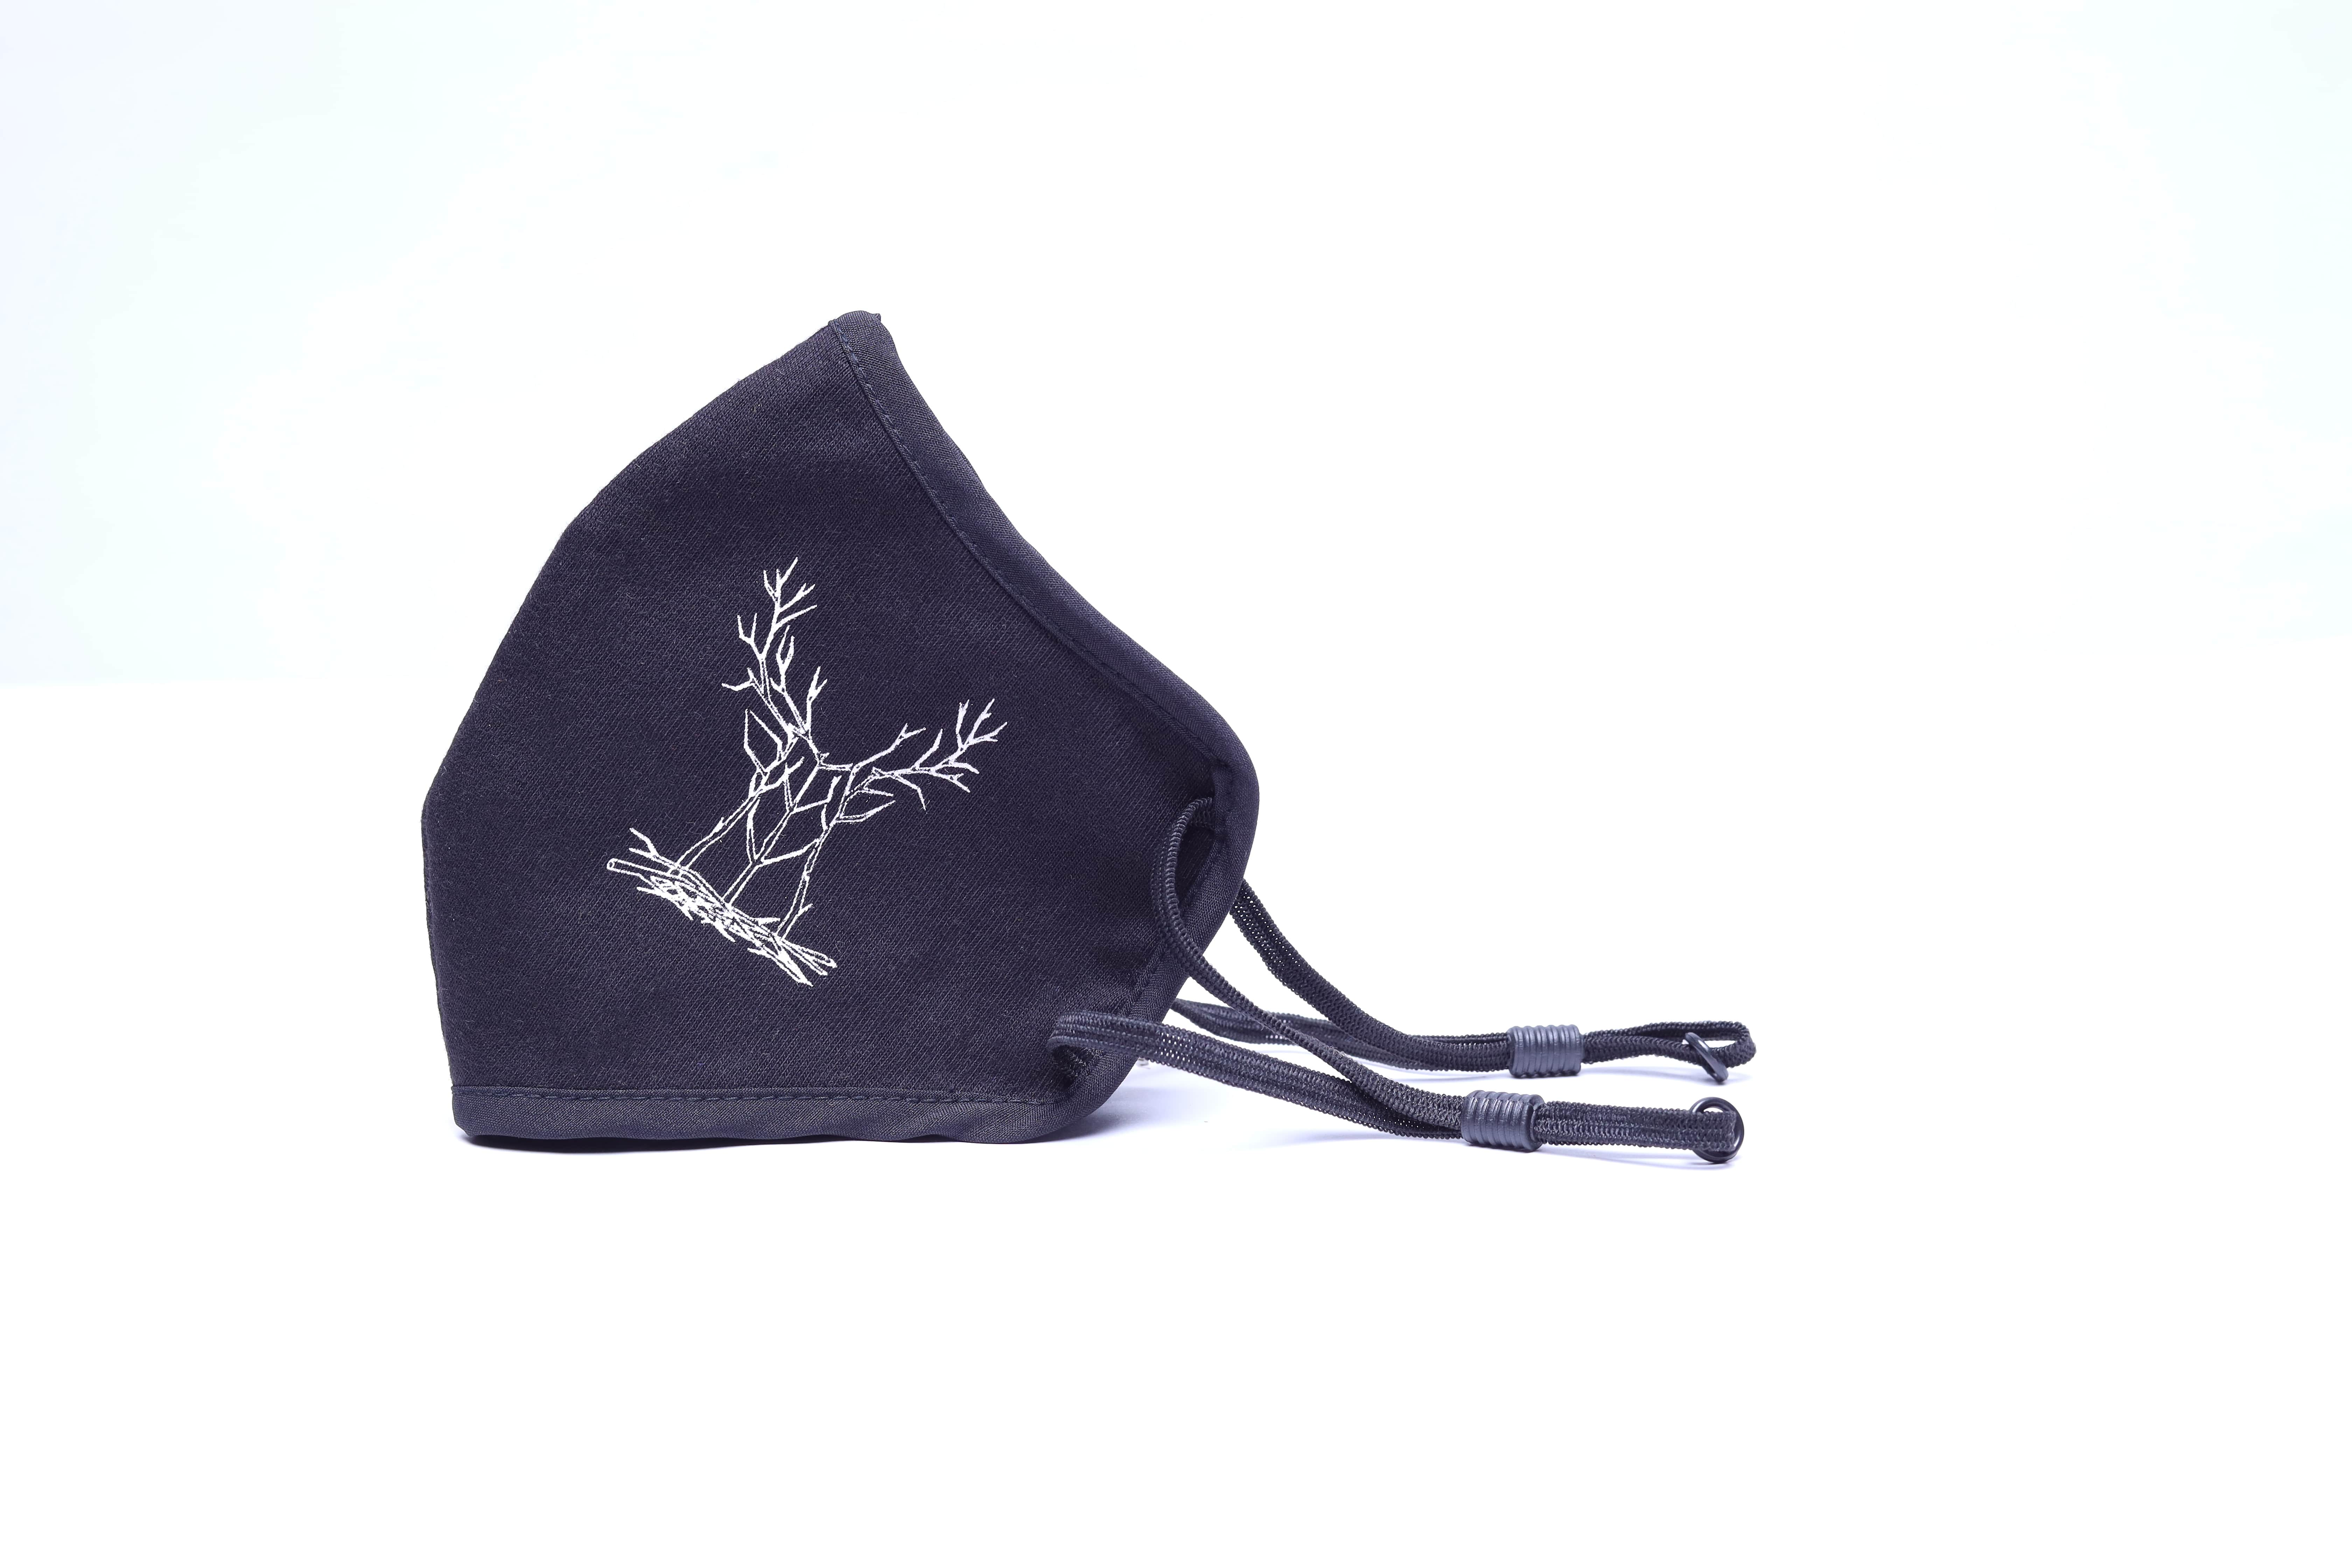 Bottle&Co | Wooden Deer: Black rPET Sustainable Facemask